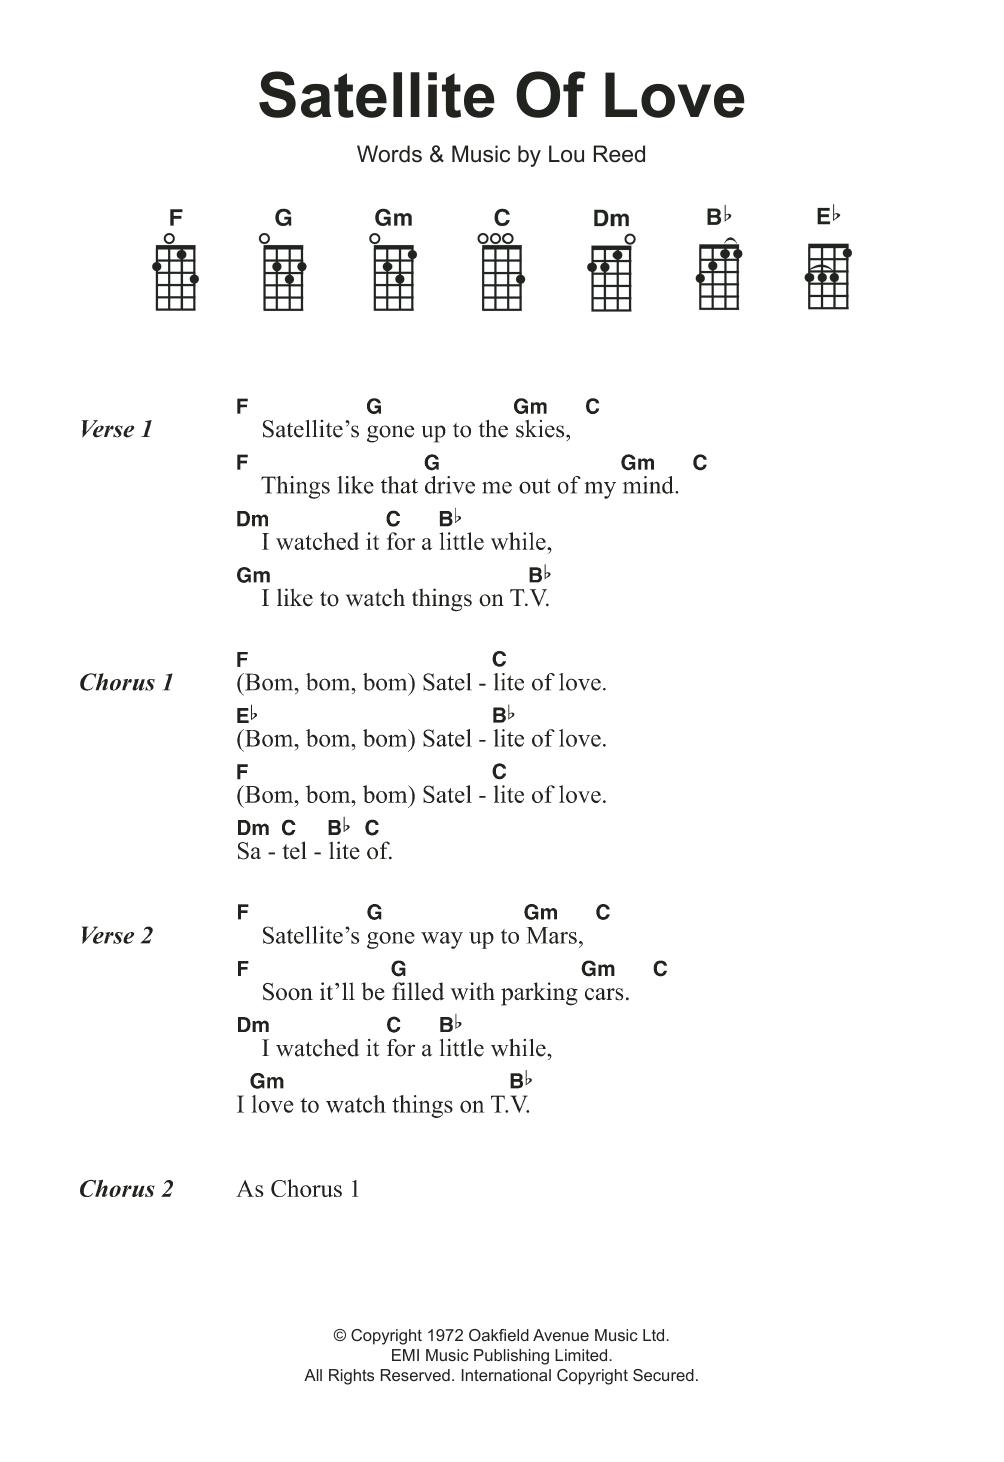 Satellite Of Love Sheet Music